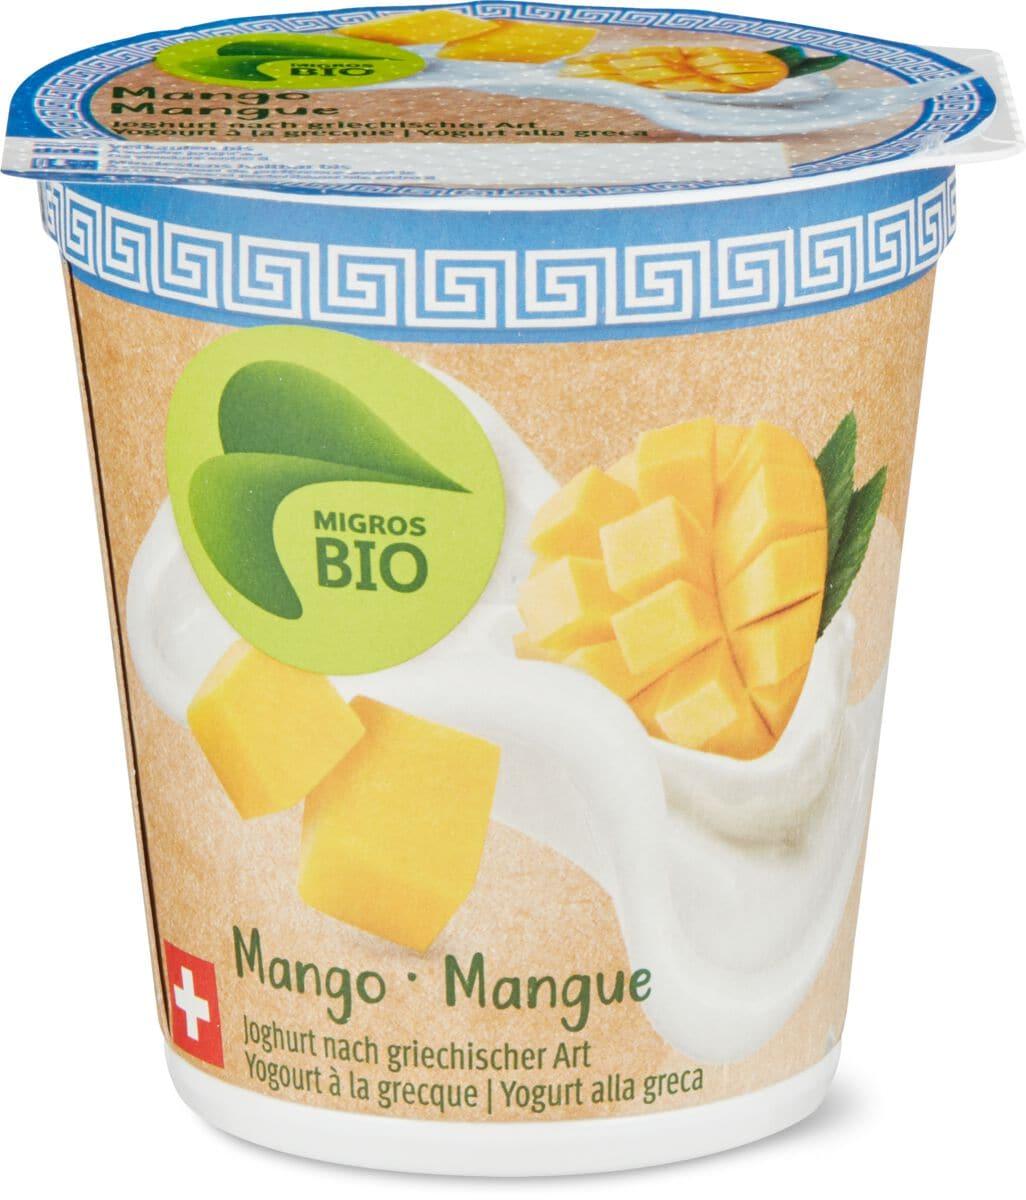 Bio Joghurt Grecque Mango